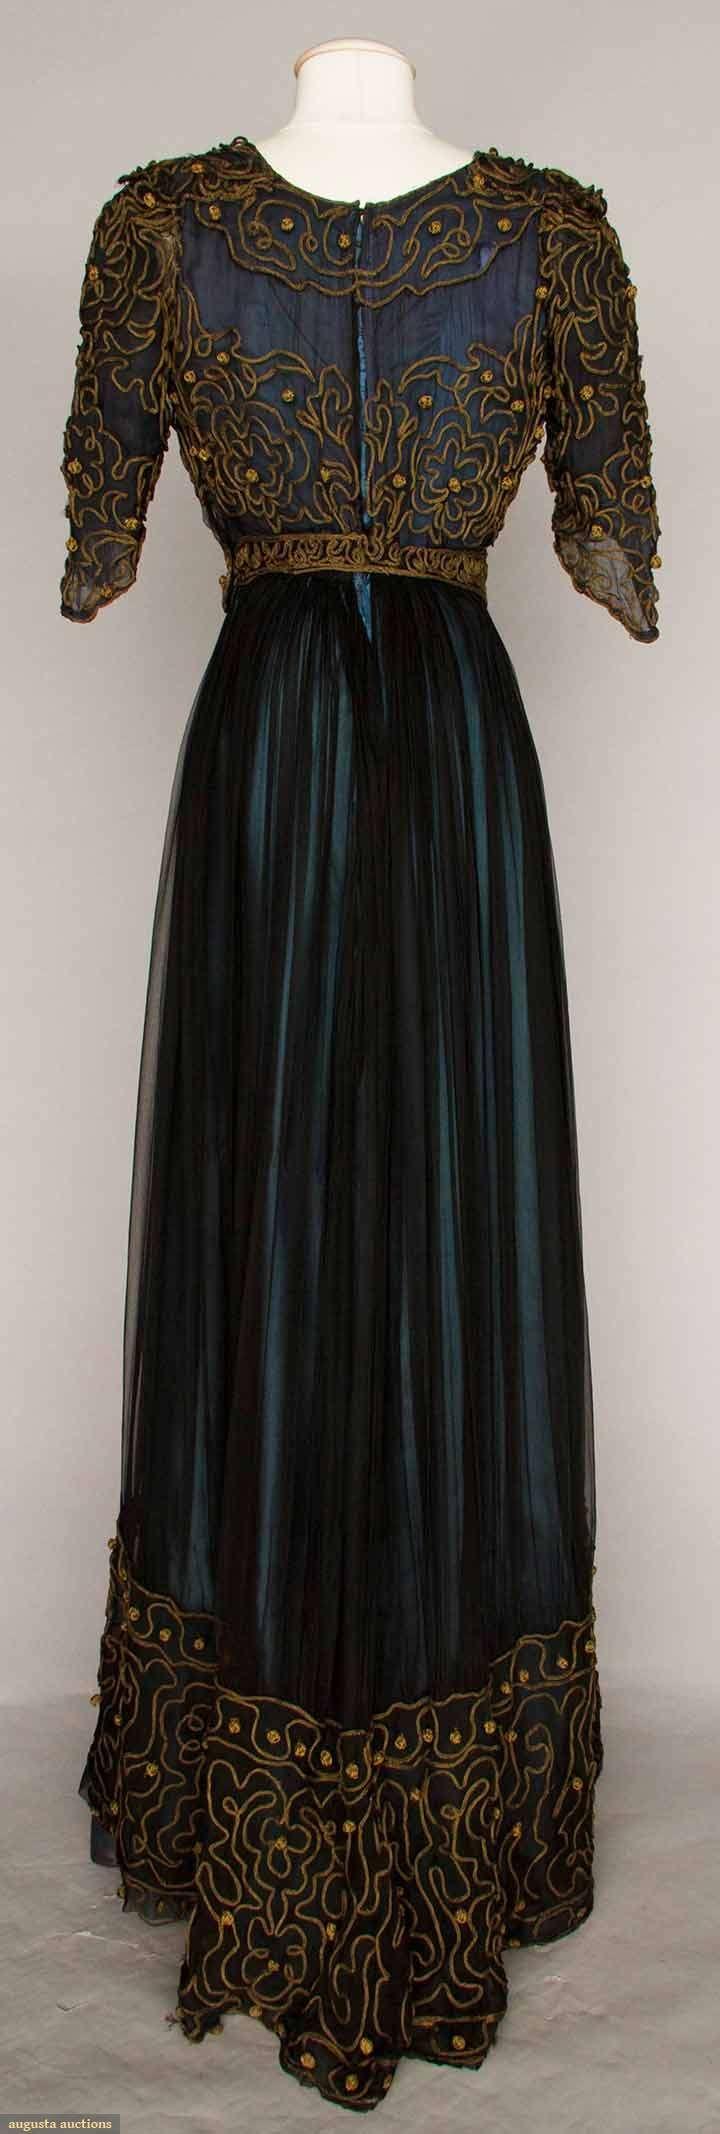 Afternoon Dress (image 2) | 1910 | silk chiffon, soutache | Augusta Auctions | May 10, 2016/Lot 1008